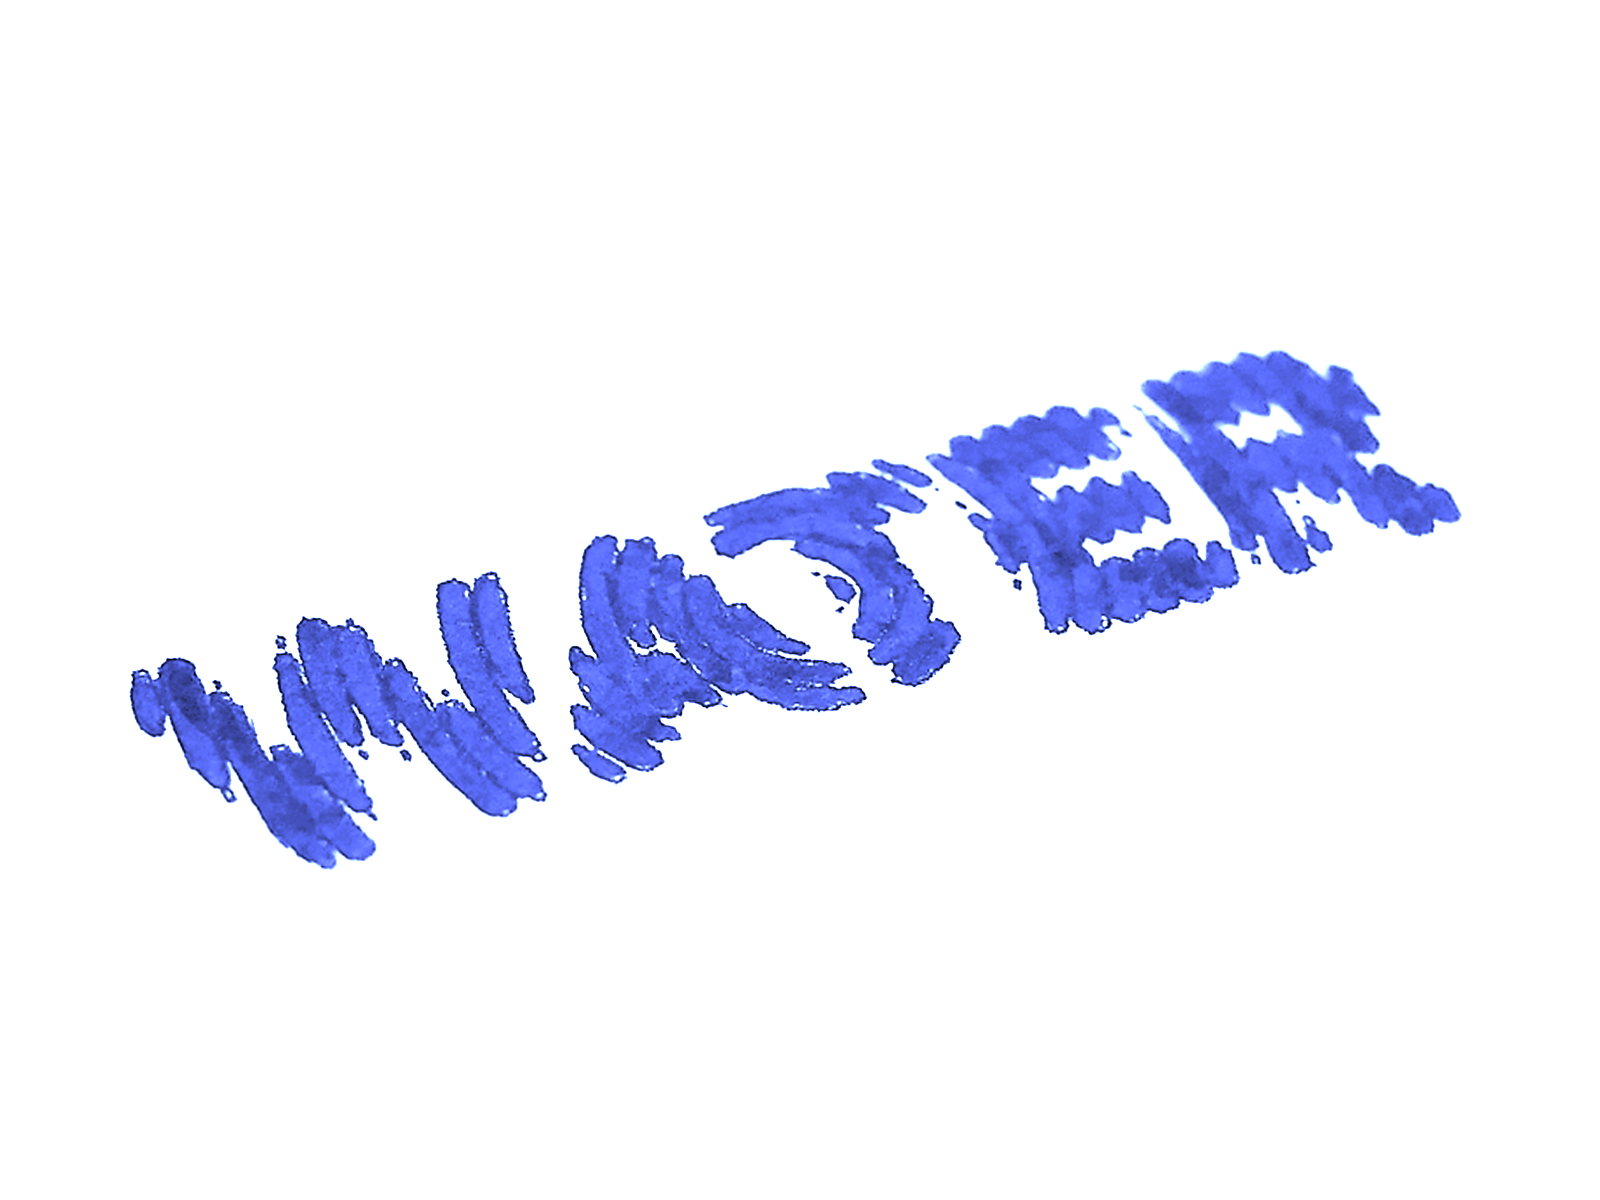 Water Wordmark - Brushed. brushed circular logo lines blue identity mark wordmark branding wave custom hand lettering liquid effect drop ripple sketch brush paint water